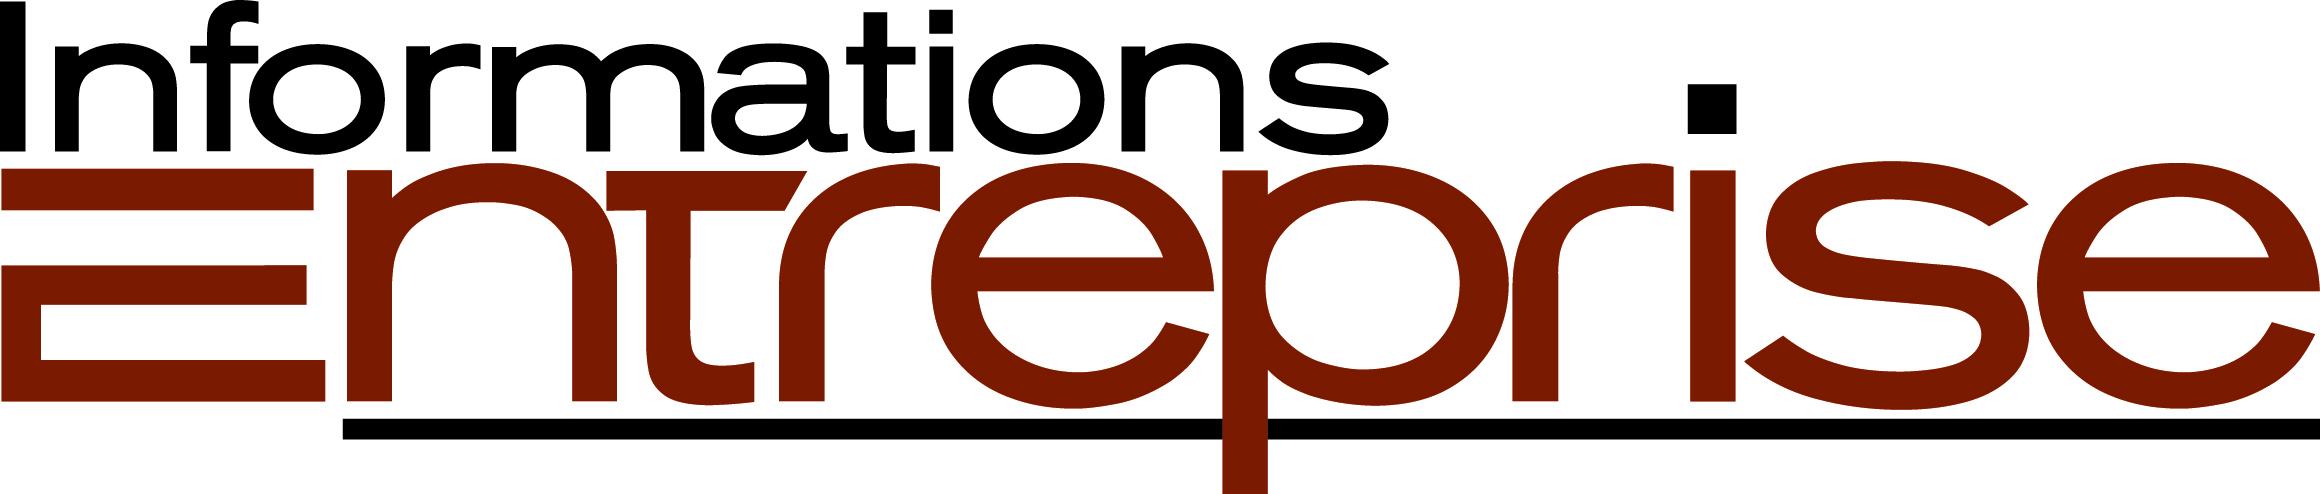 Logo informations entreprise iKentoo caisse iPAd.jpg